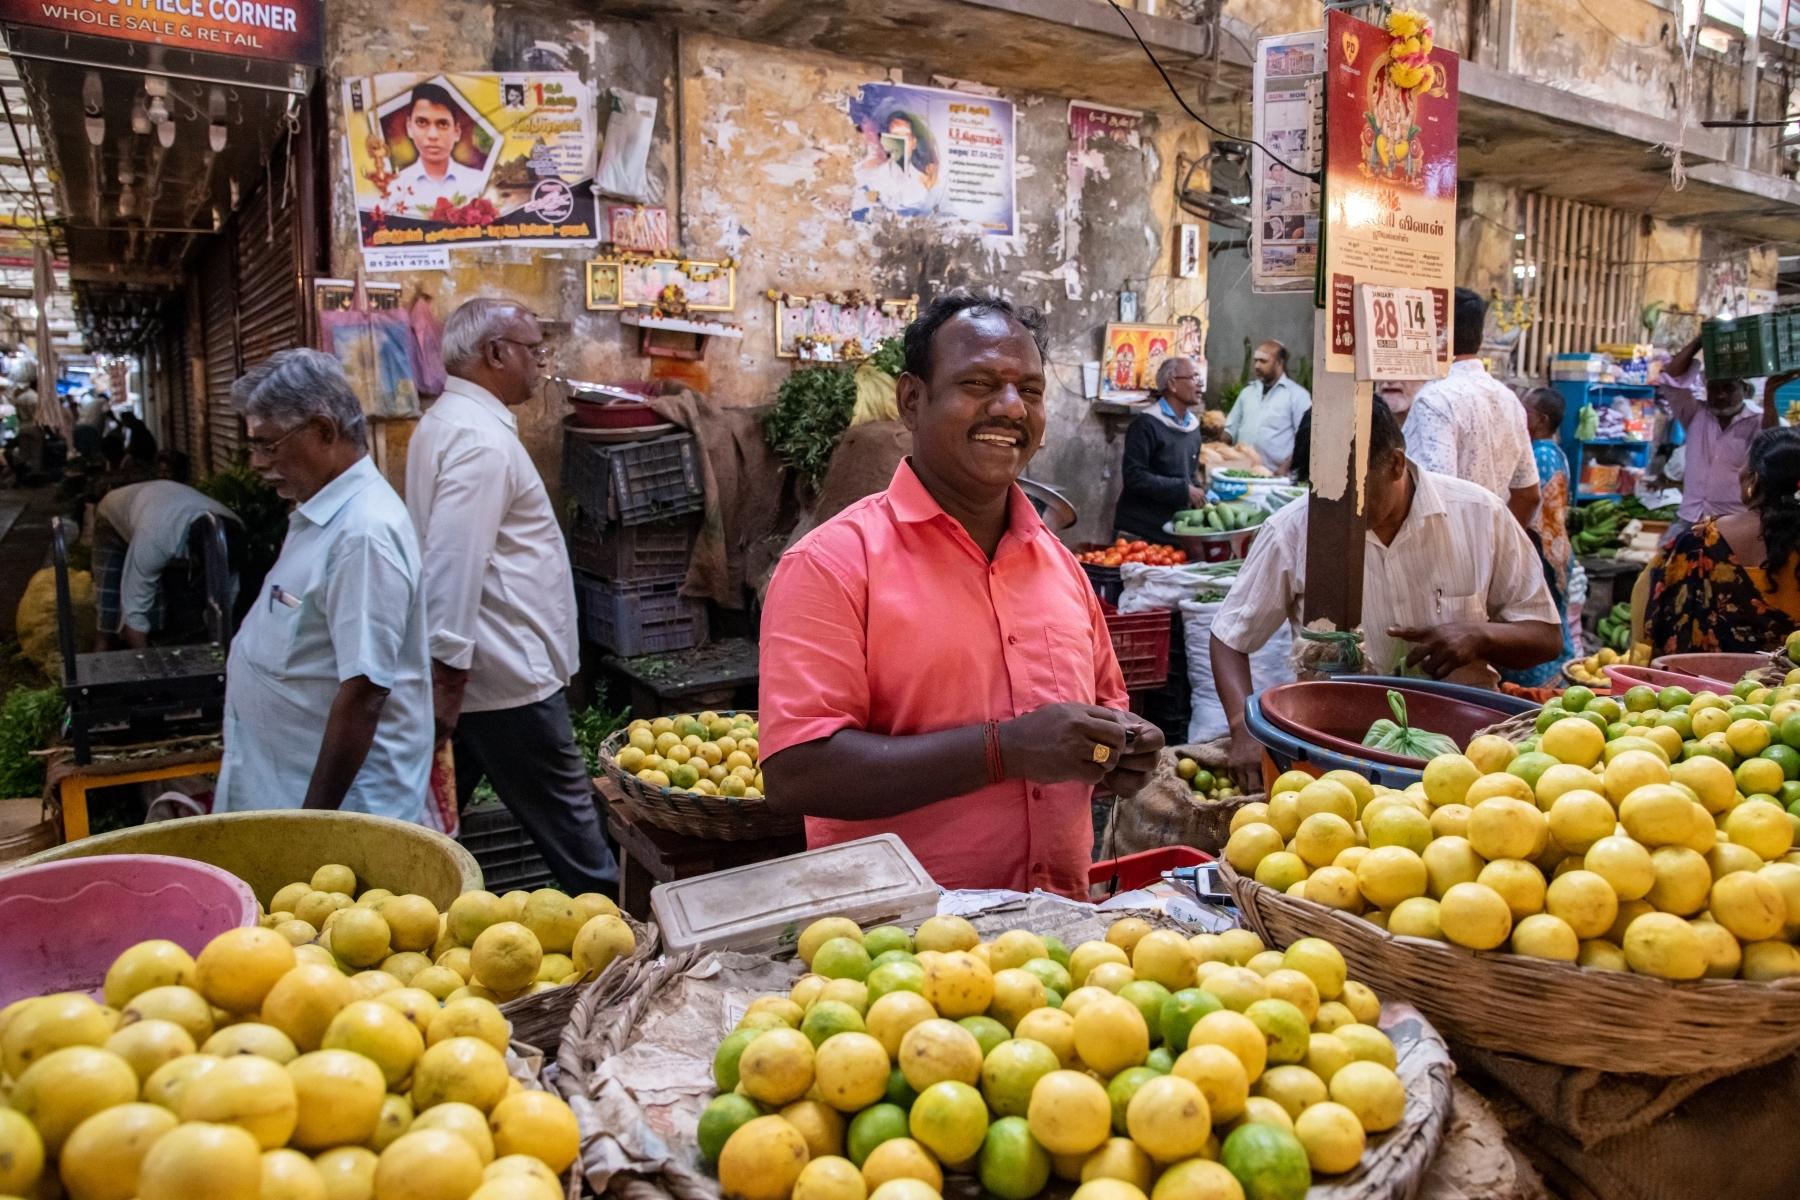 Food-Vendor-selling-lemons-at-the-busy-Pondy-Food-Market-Pondicherry-India.-January-2020.-TM-0-Place-by-Carol-Thomas-BK